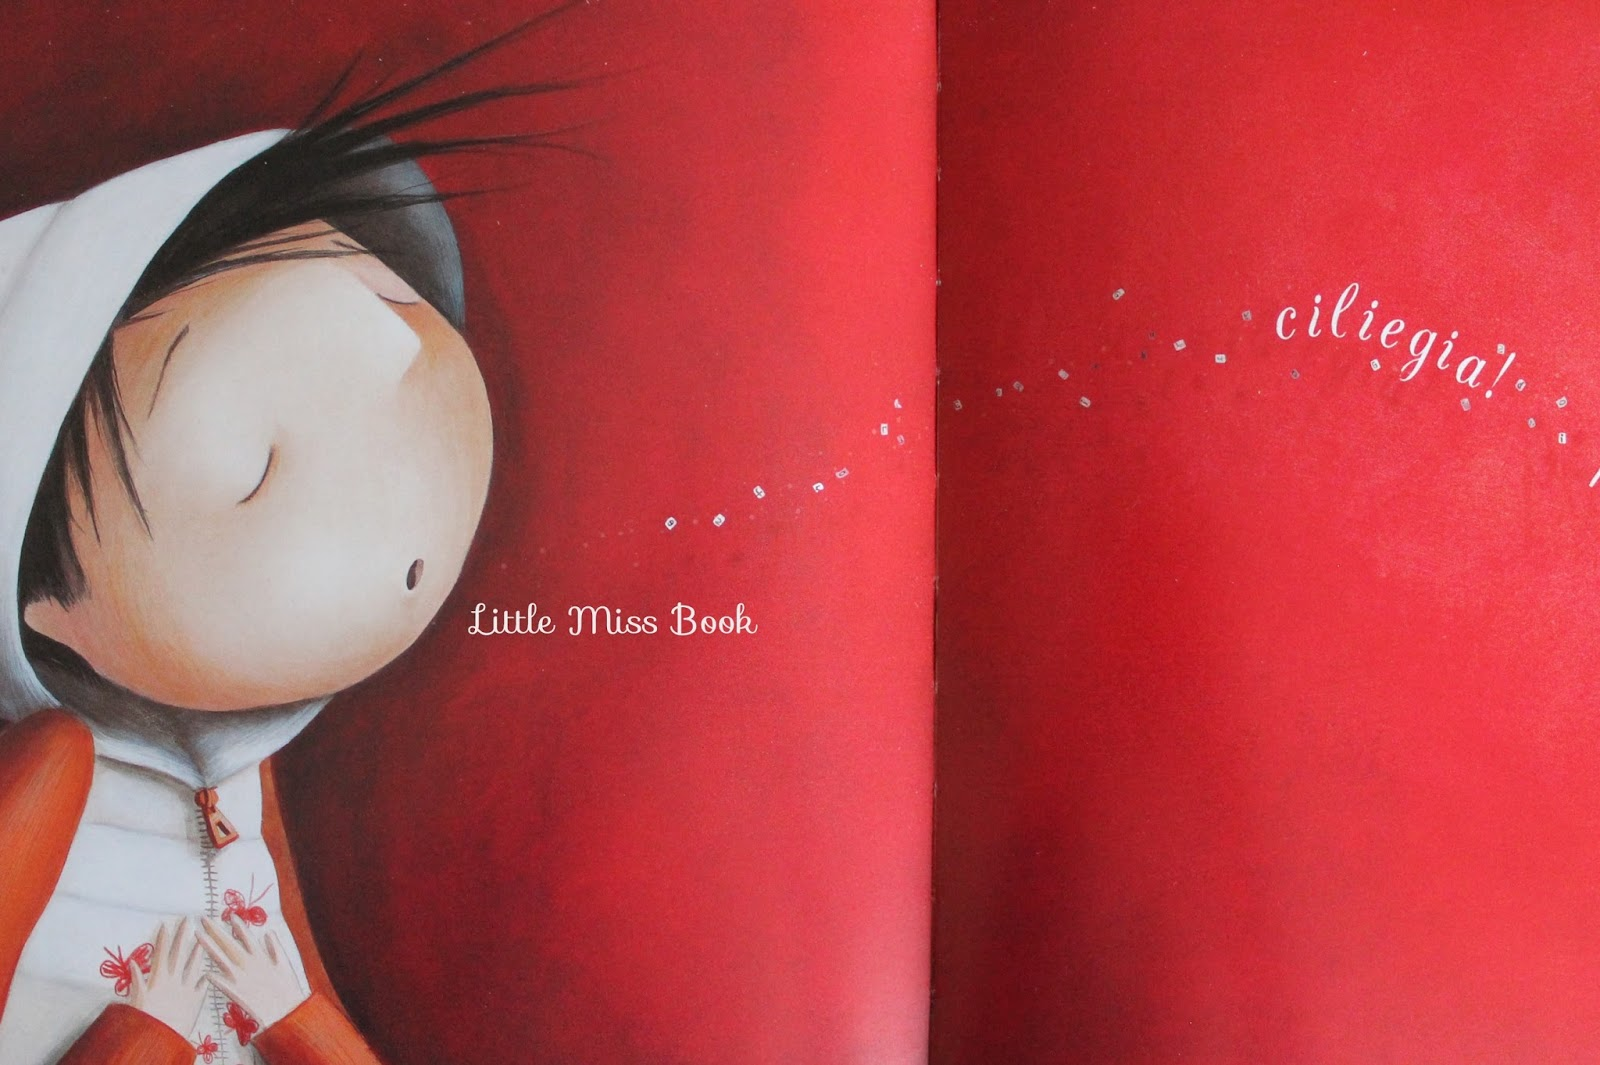 Little Miss Book Fingerbook La Grande Fabbrica Delle